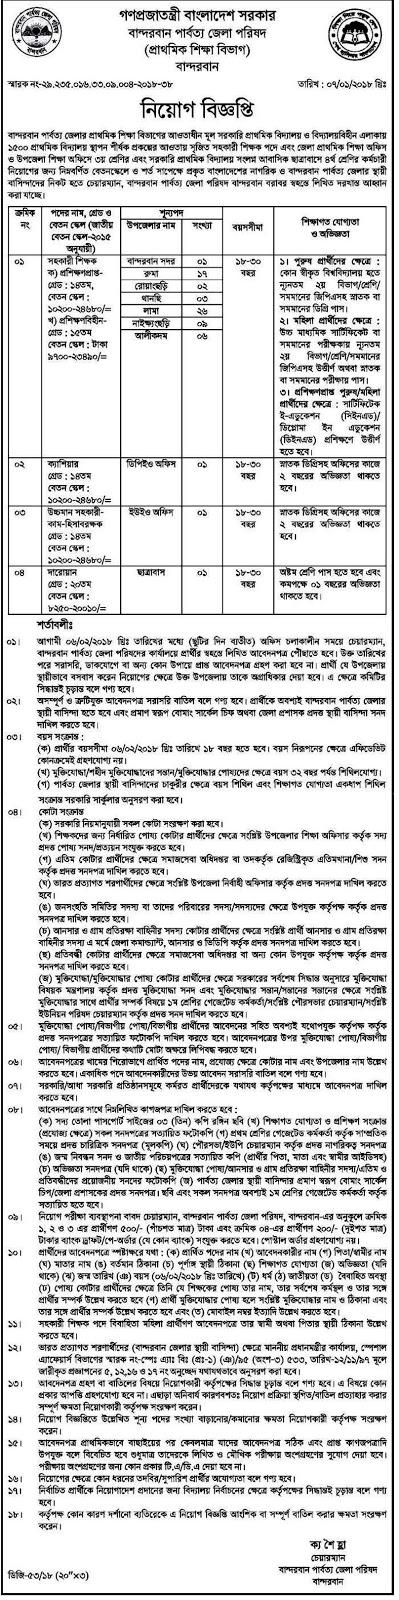 Primary School Teacher Jobs Circular 2018 - www dpe gov bd